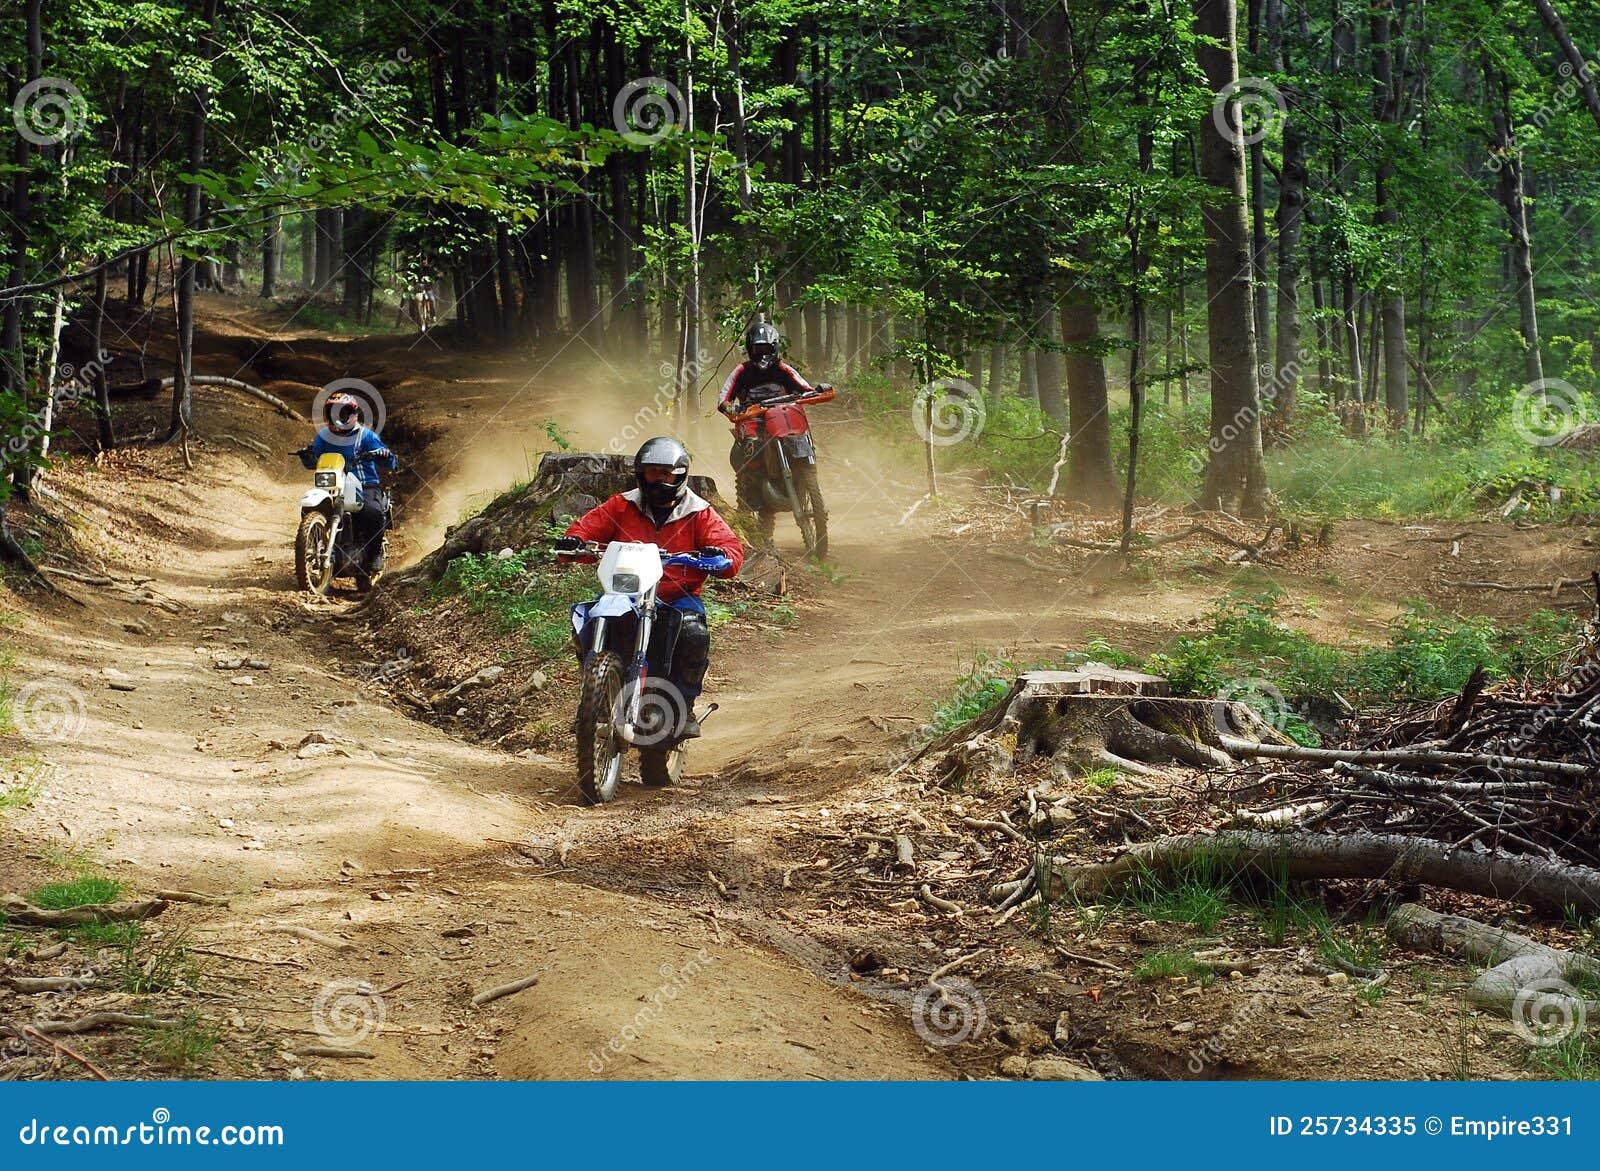 Enduro riders